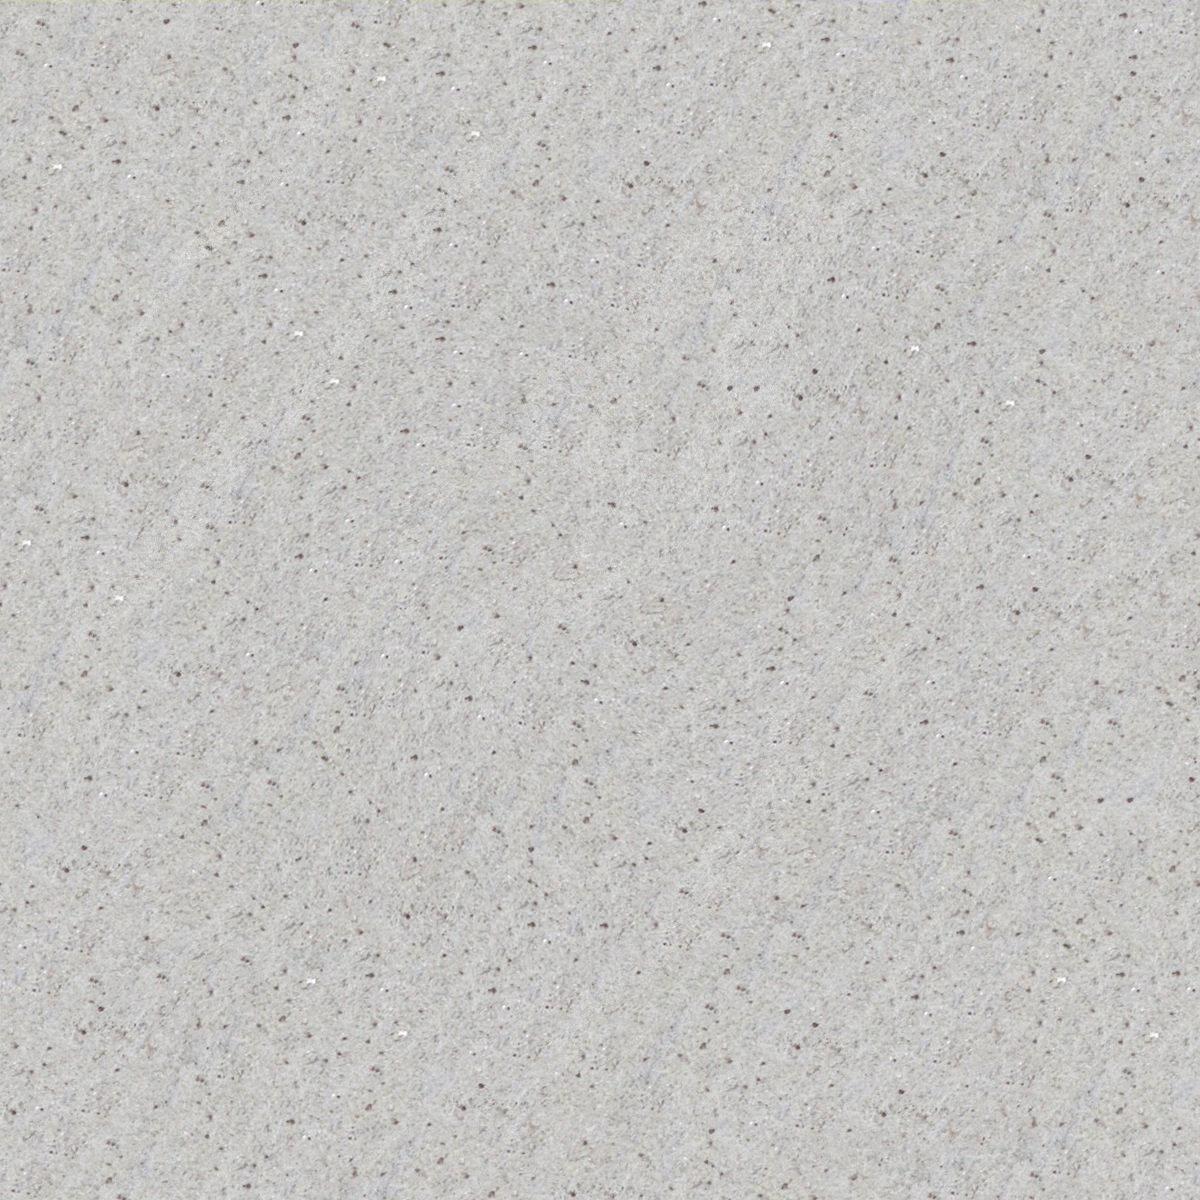 White Granite   Double Kitchen Sink